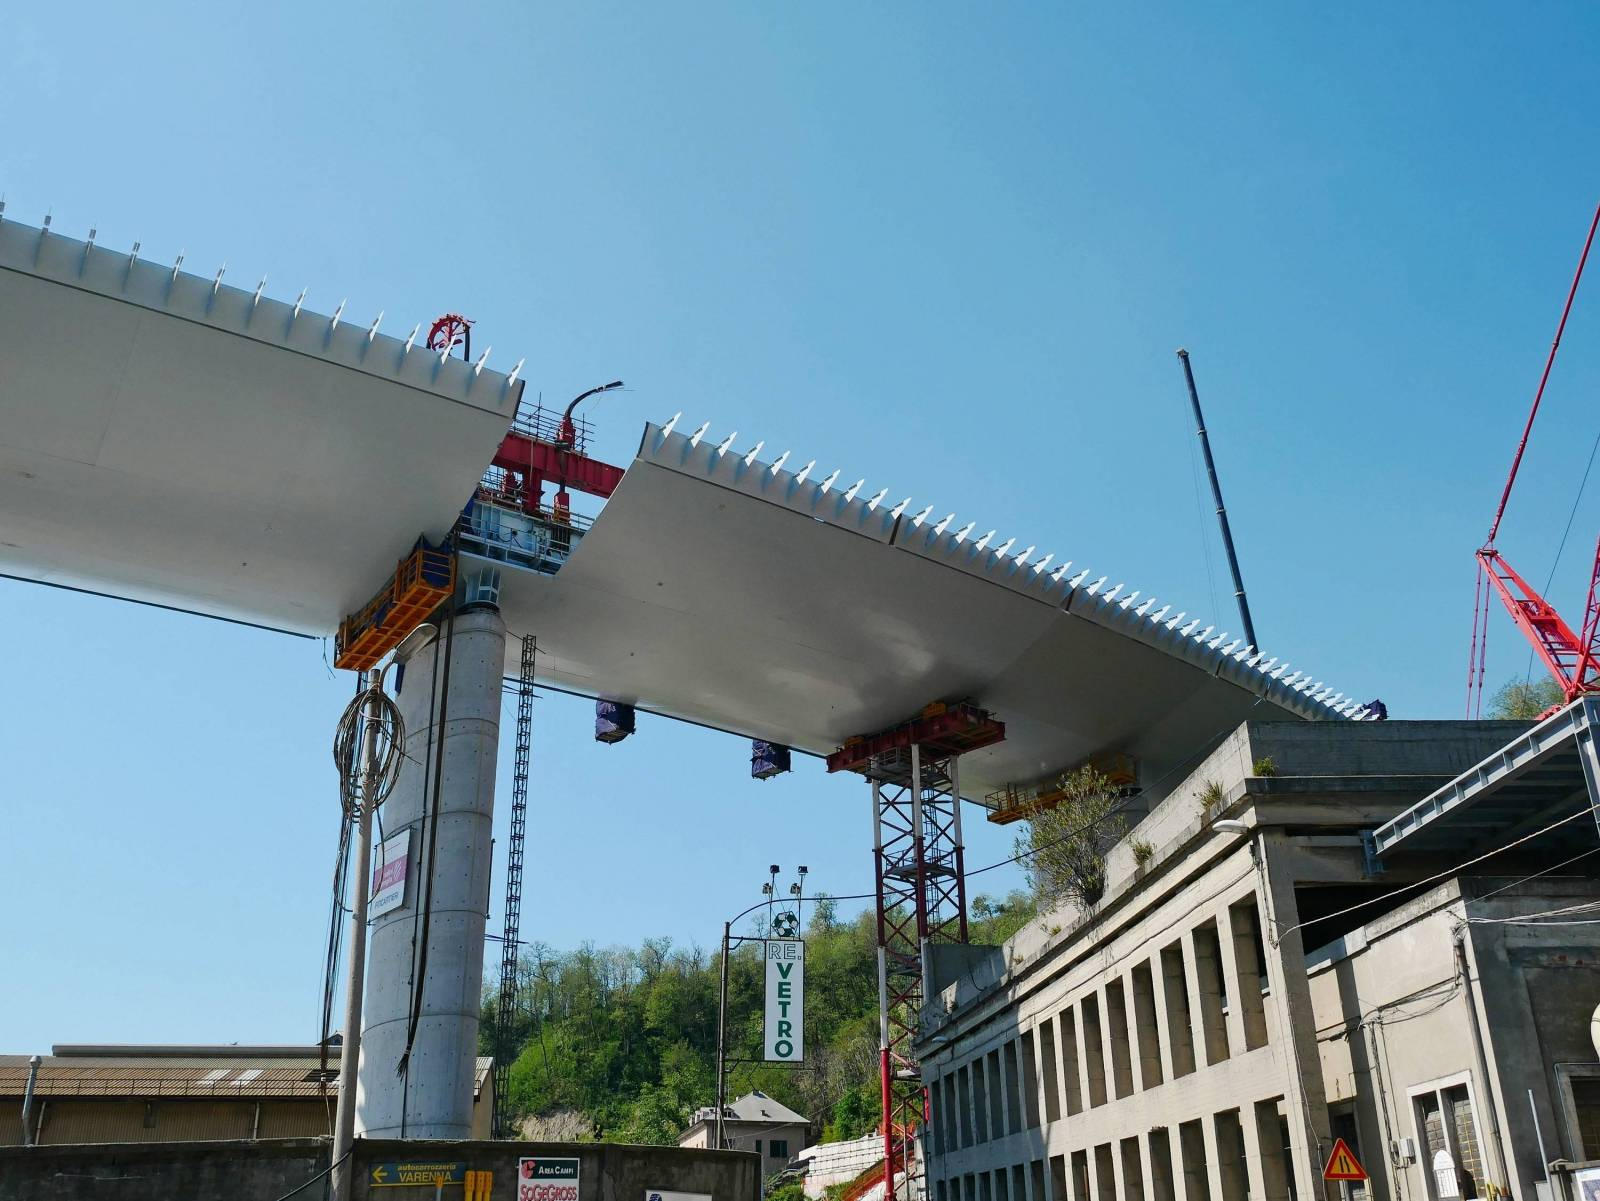 New Genoa shipyard, Ex Morandi, the new bridge over Corso Perrone that connects to the highway